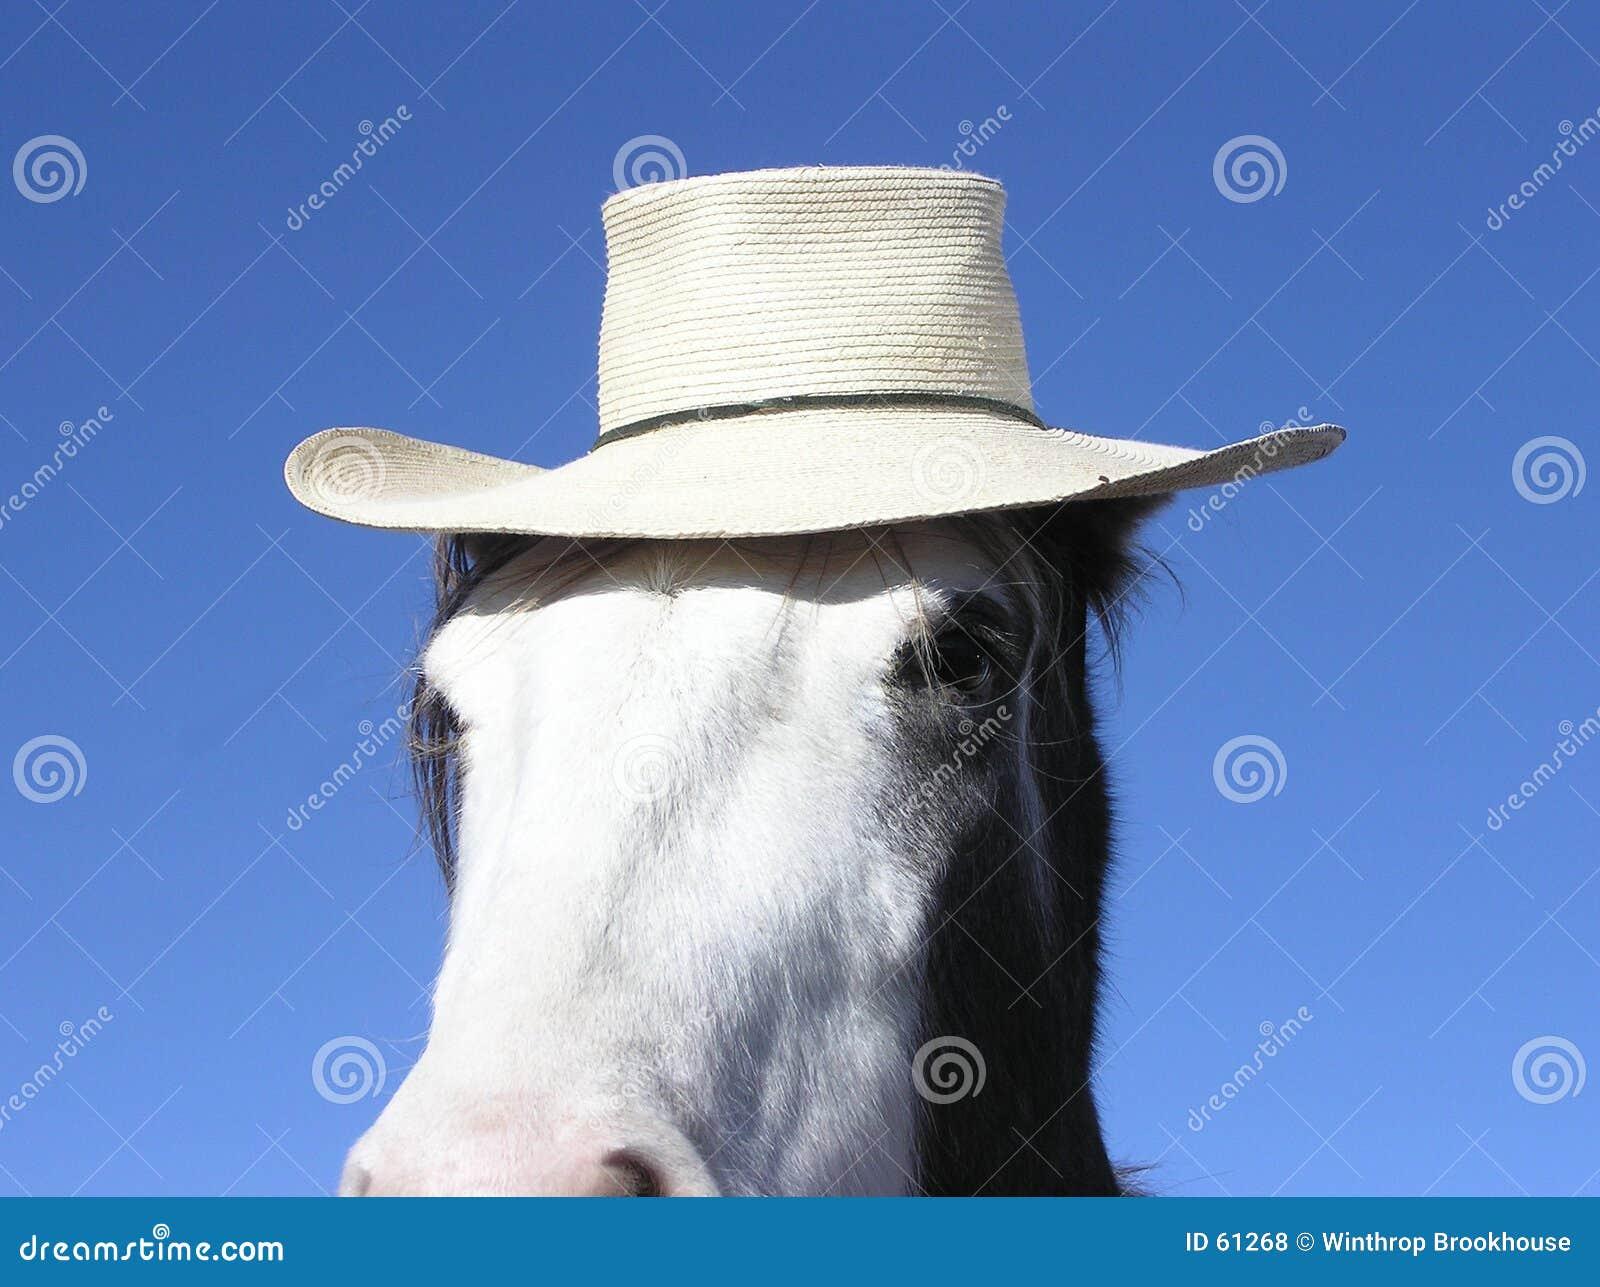 Download φθορά αλόγων καπέλων στοκ εικόνες. εικόνα από άχυρο, ισπανικά - 61268